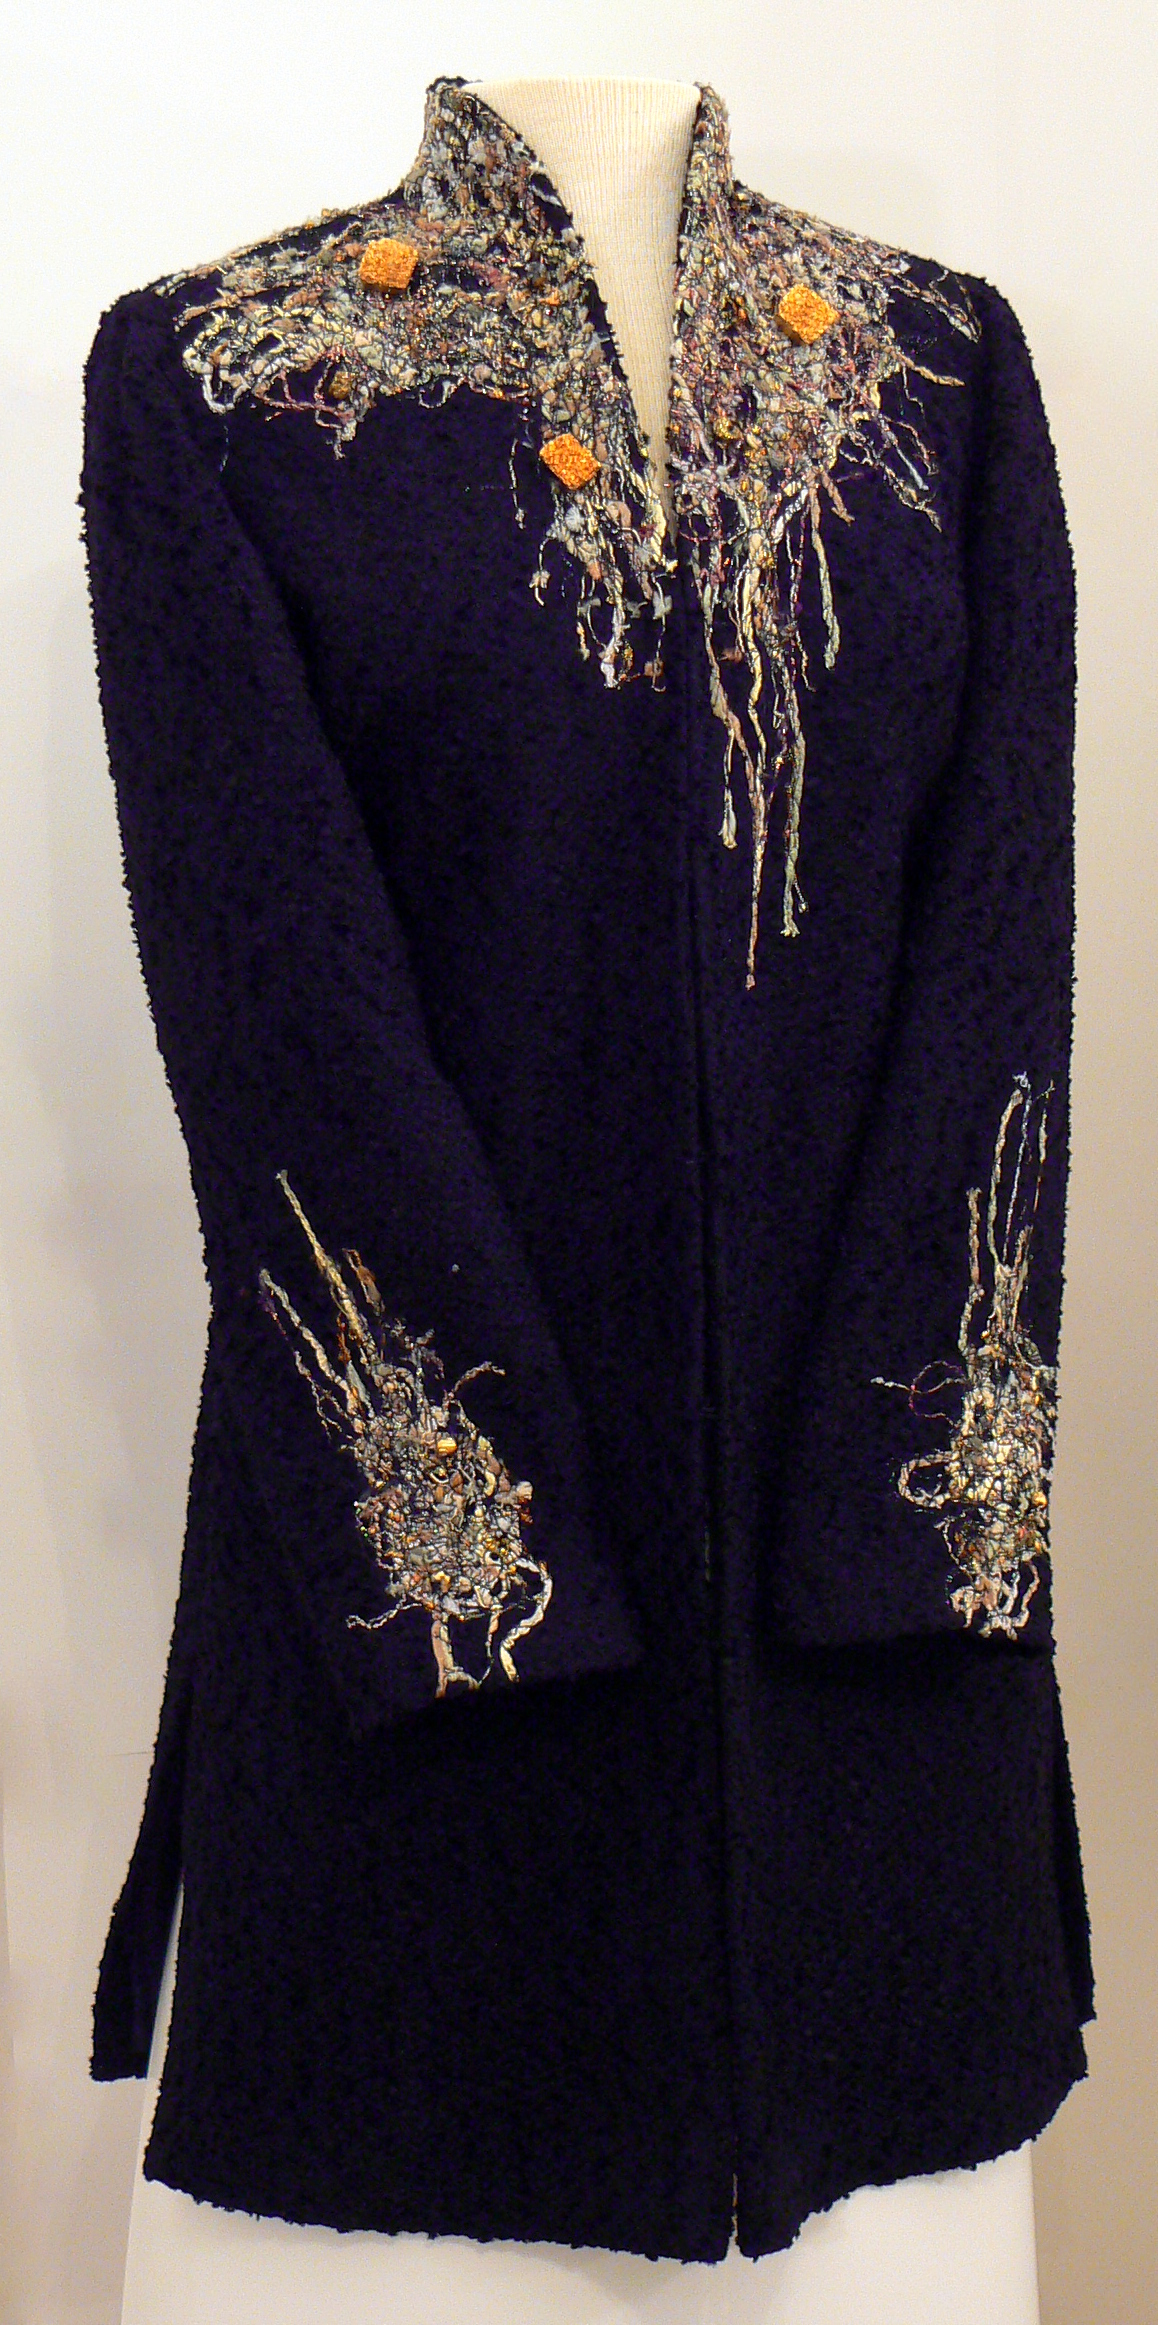 Handwoven Clothing, Coats, Kathleen Weir-West, 28-001.JPG